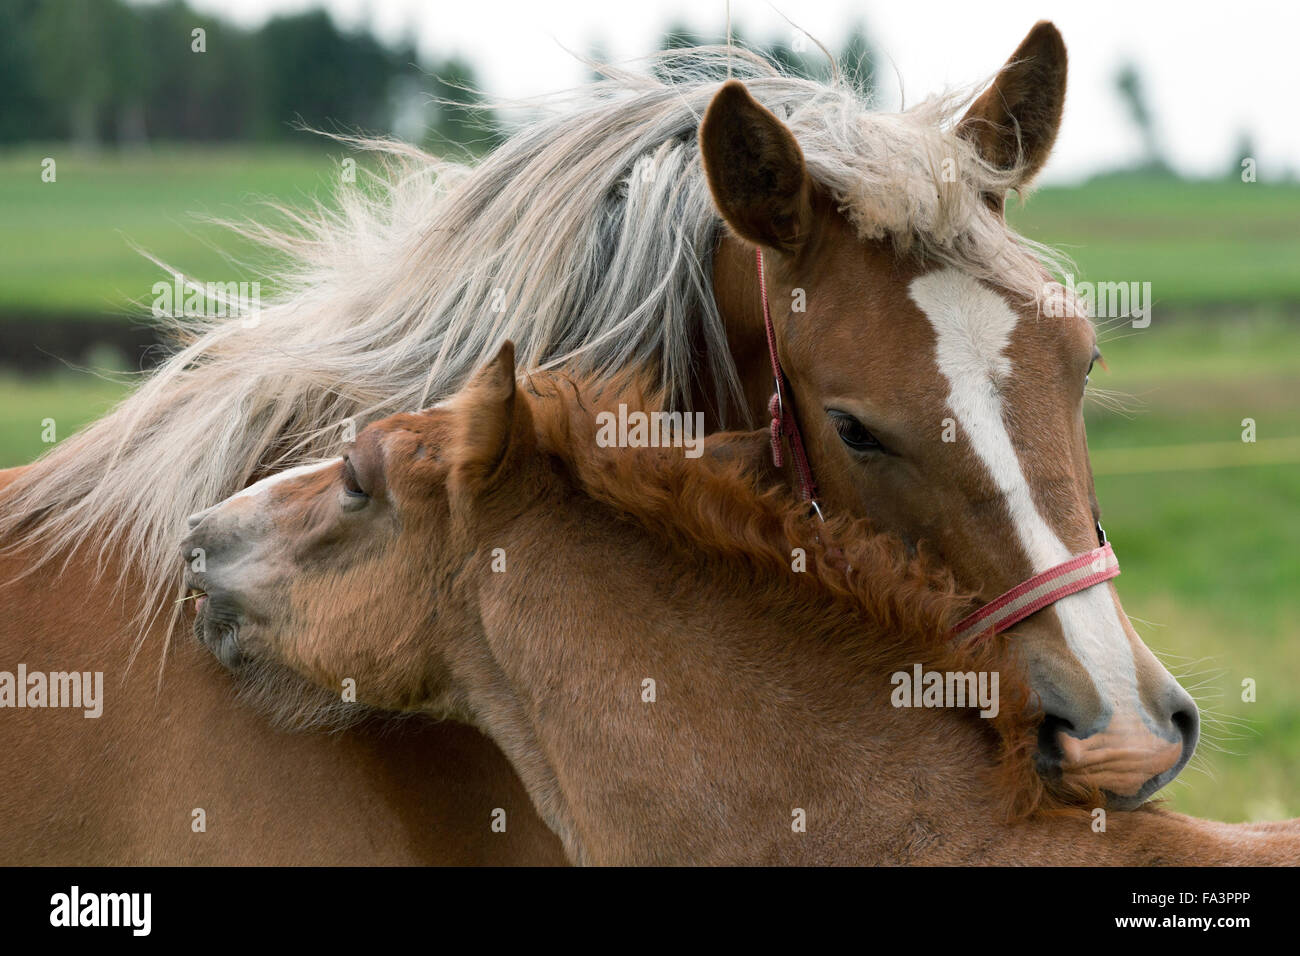 Heavy Draft Horse Lithuania Endangered Breed Rare Stock Photo Alamy